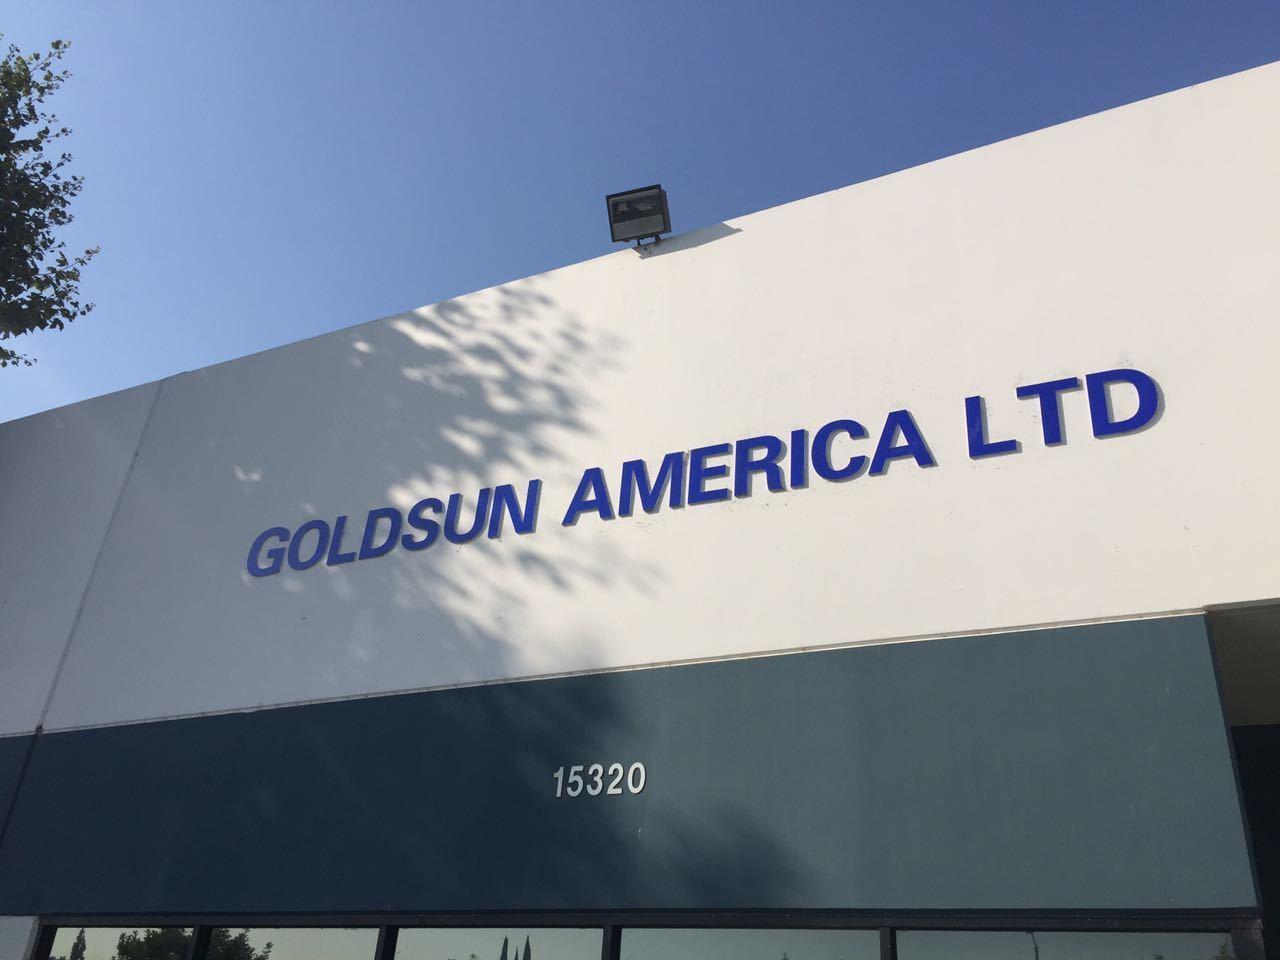 Goldsun America LTD